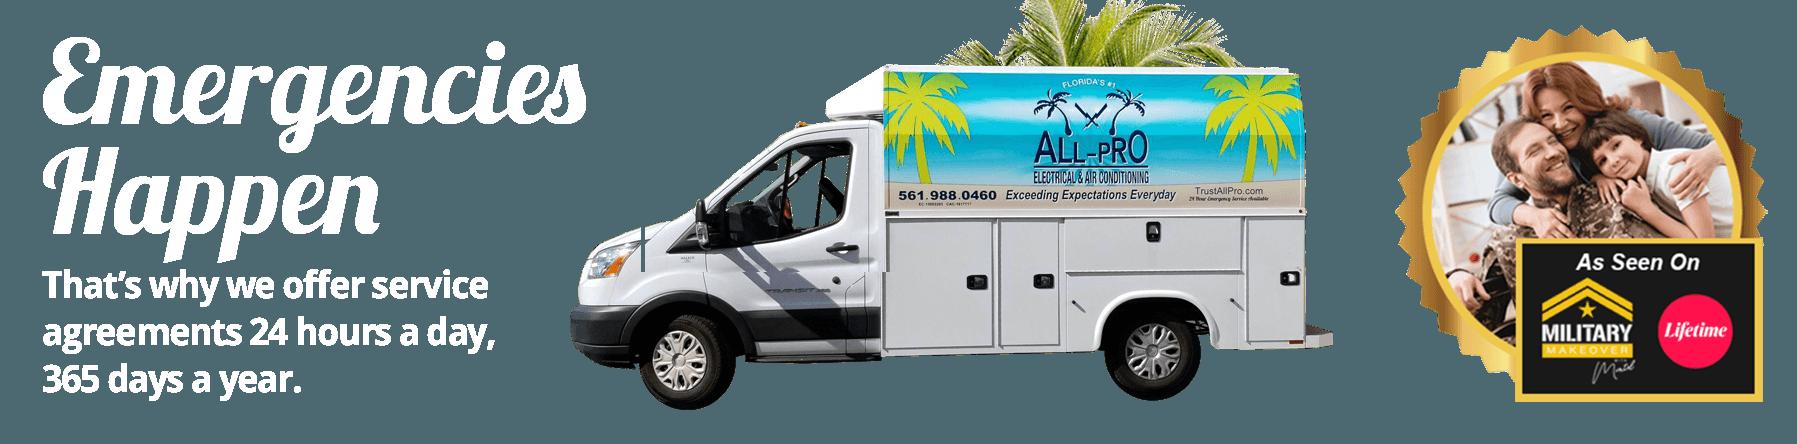 All-Pro Electrical & Air Conditioning Boca Raton Florida Ac Repair